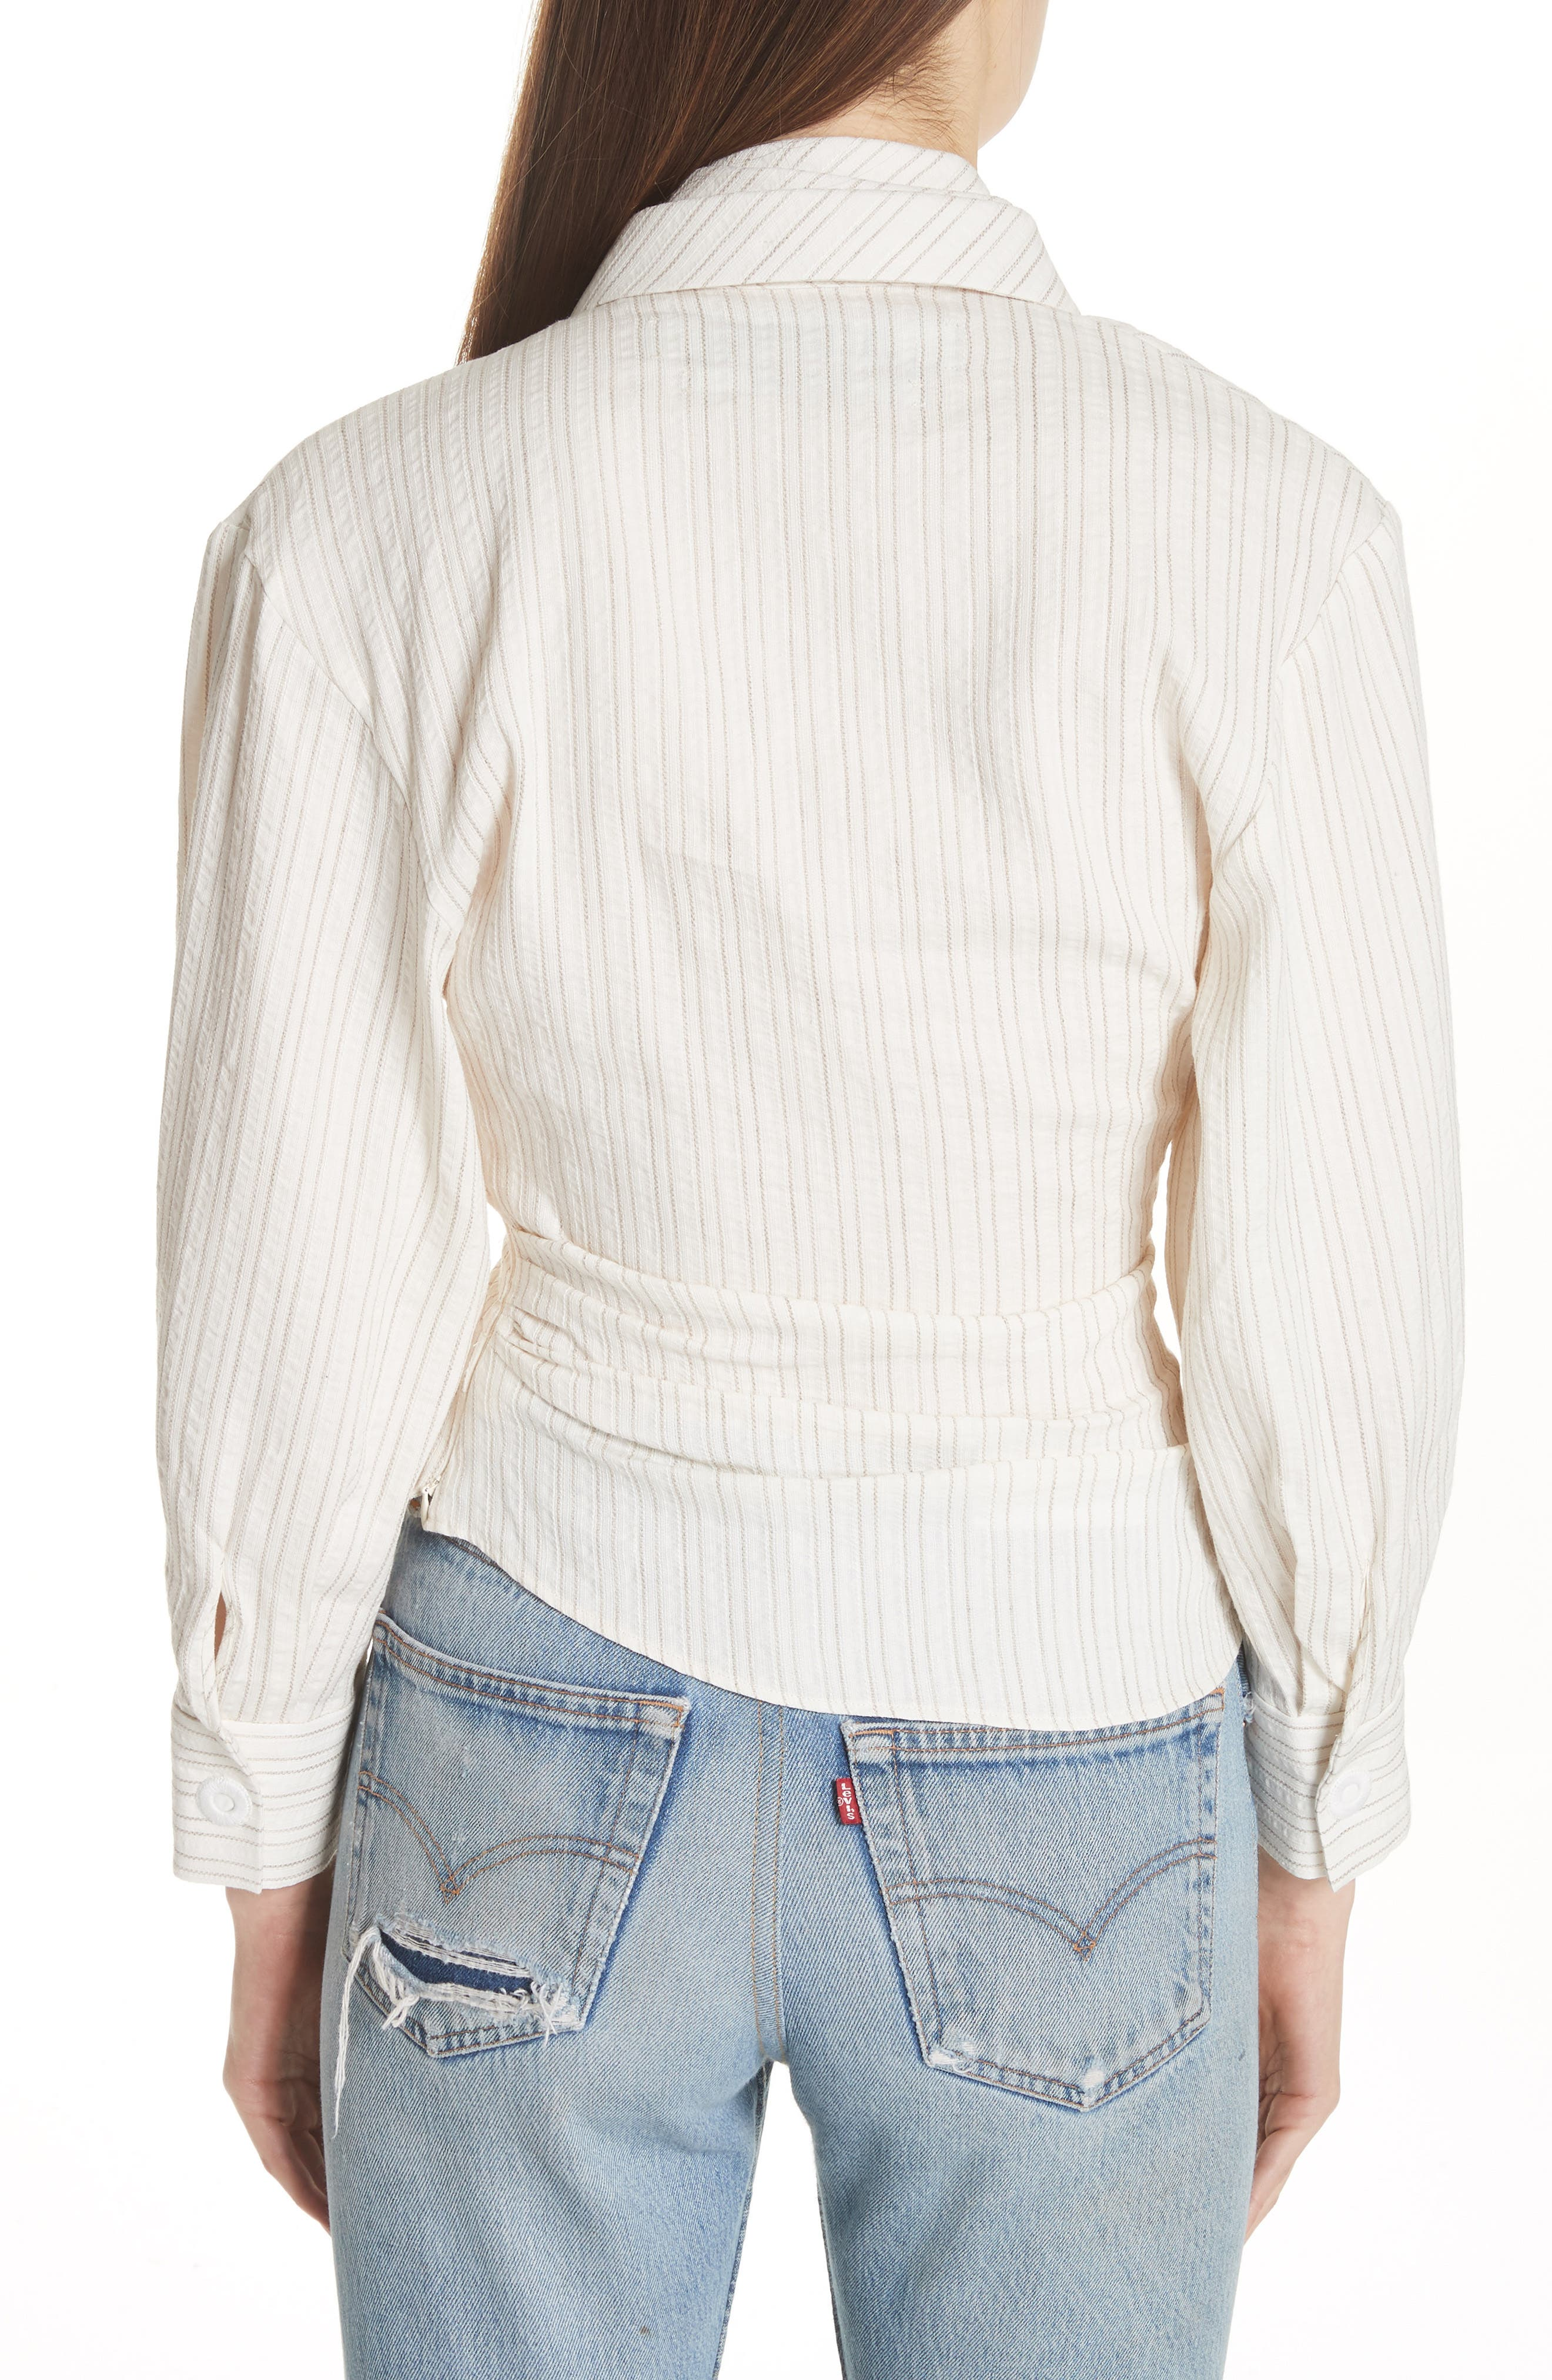 La Chemise Belem Shirt,                             Alternate thumbnail 2, color,                             250